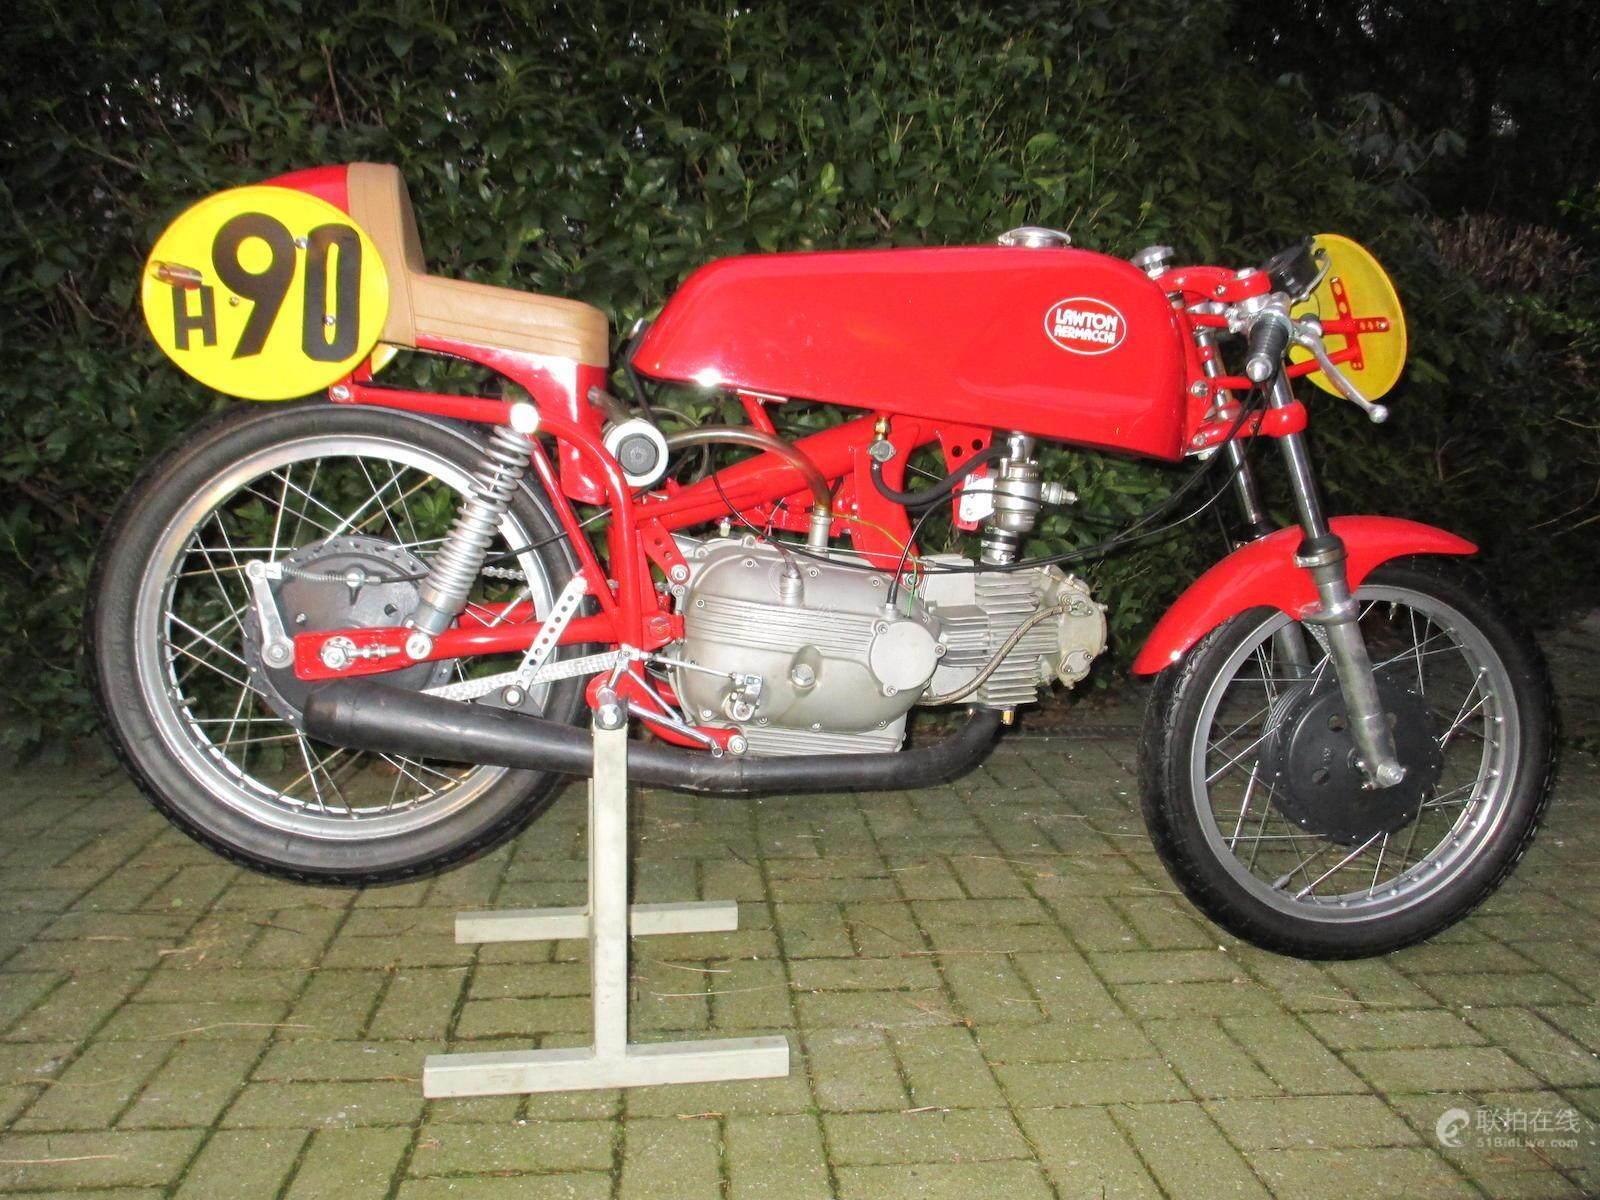 51BidLive-['Lawton' Aermacchi 249cc Racing Motorcycle Frame